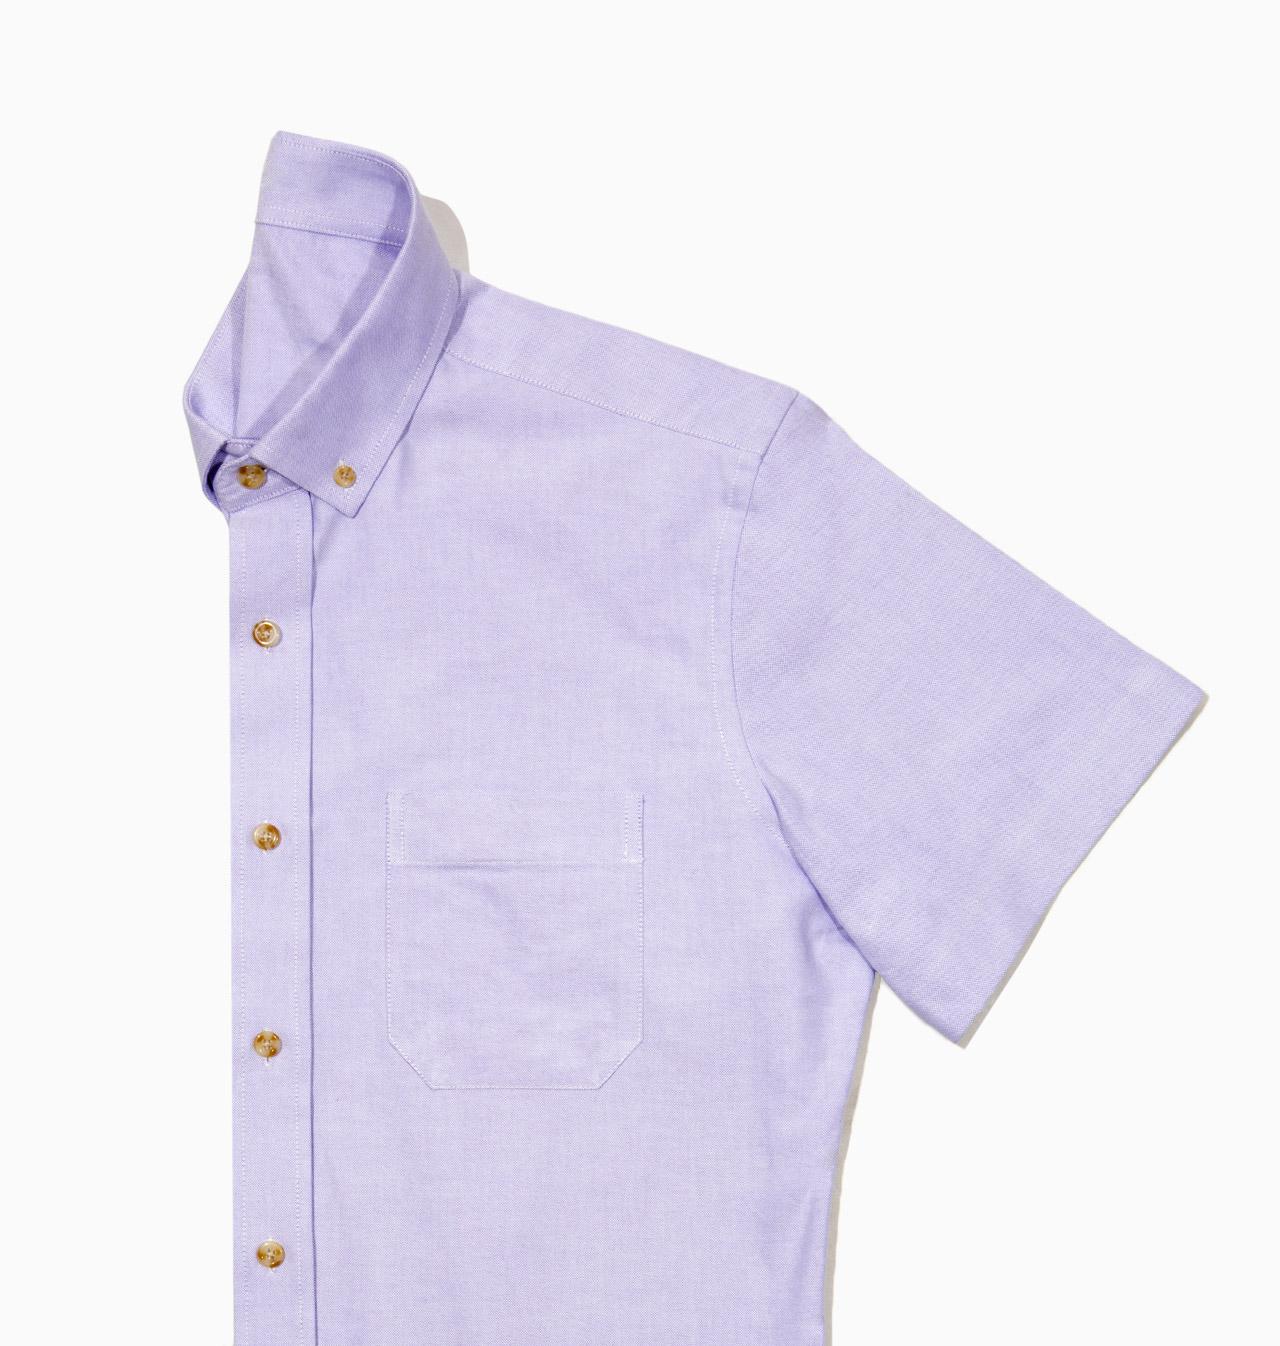 Blank Label Award Winning Mens Custom Suits Dress Shirts